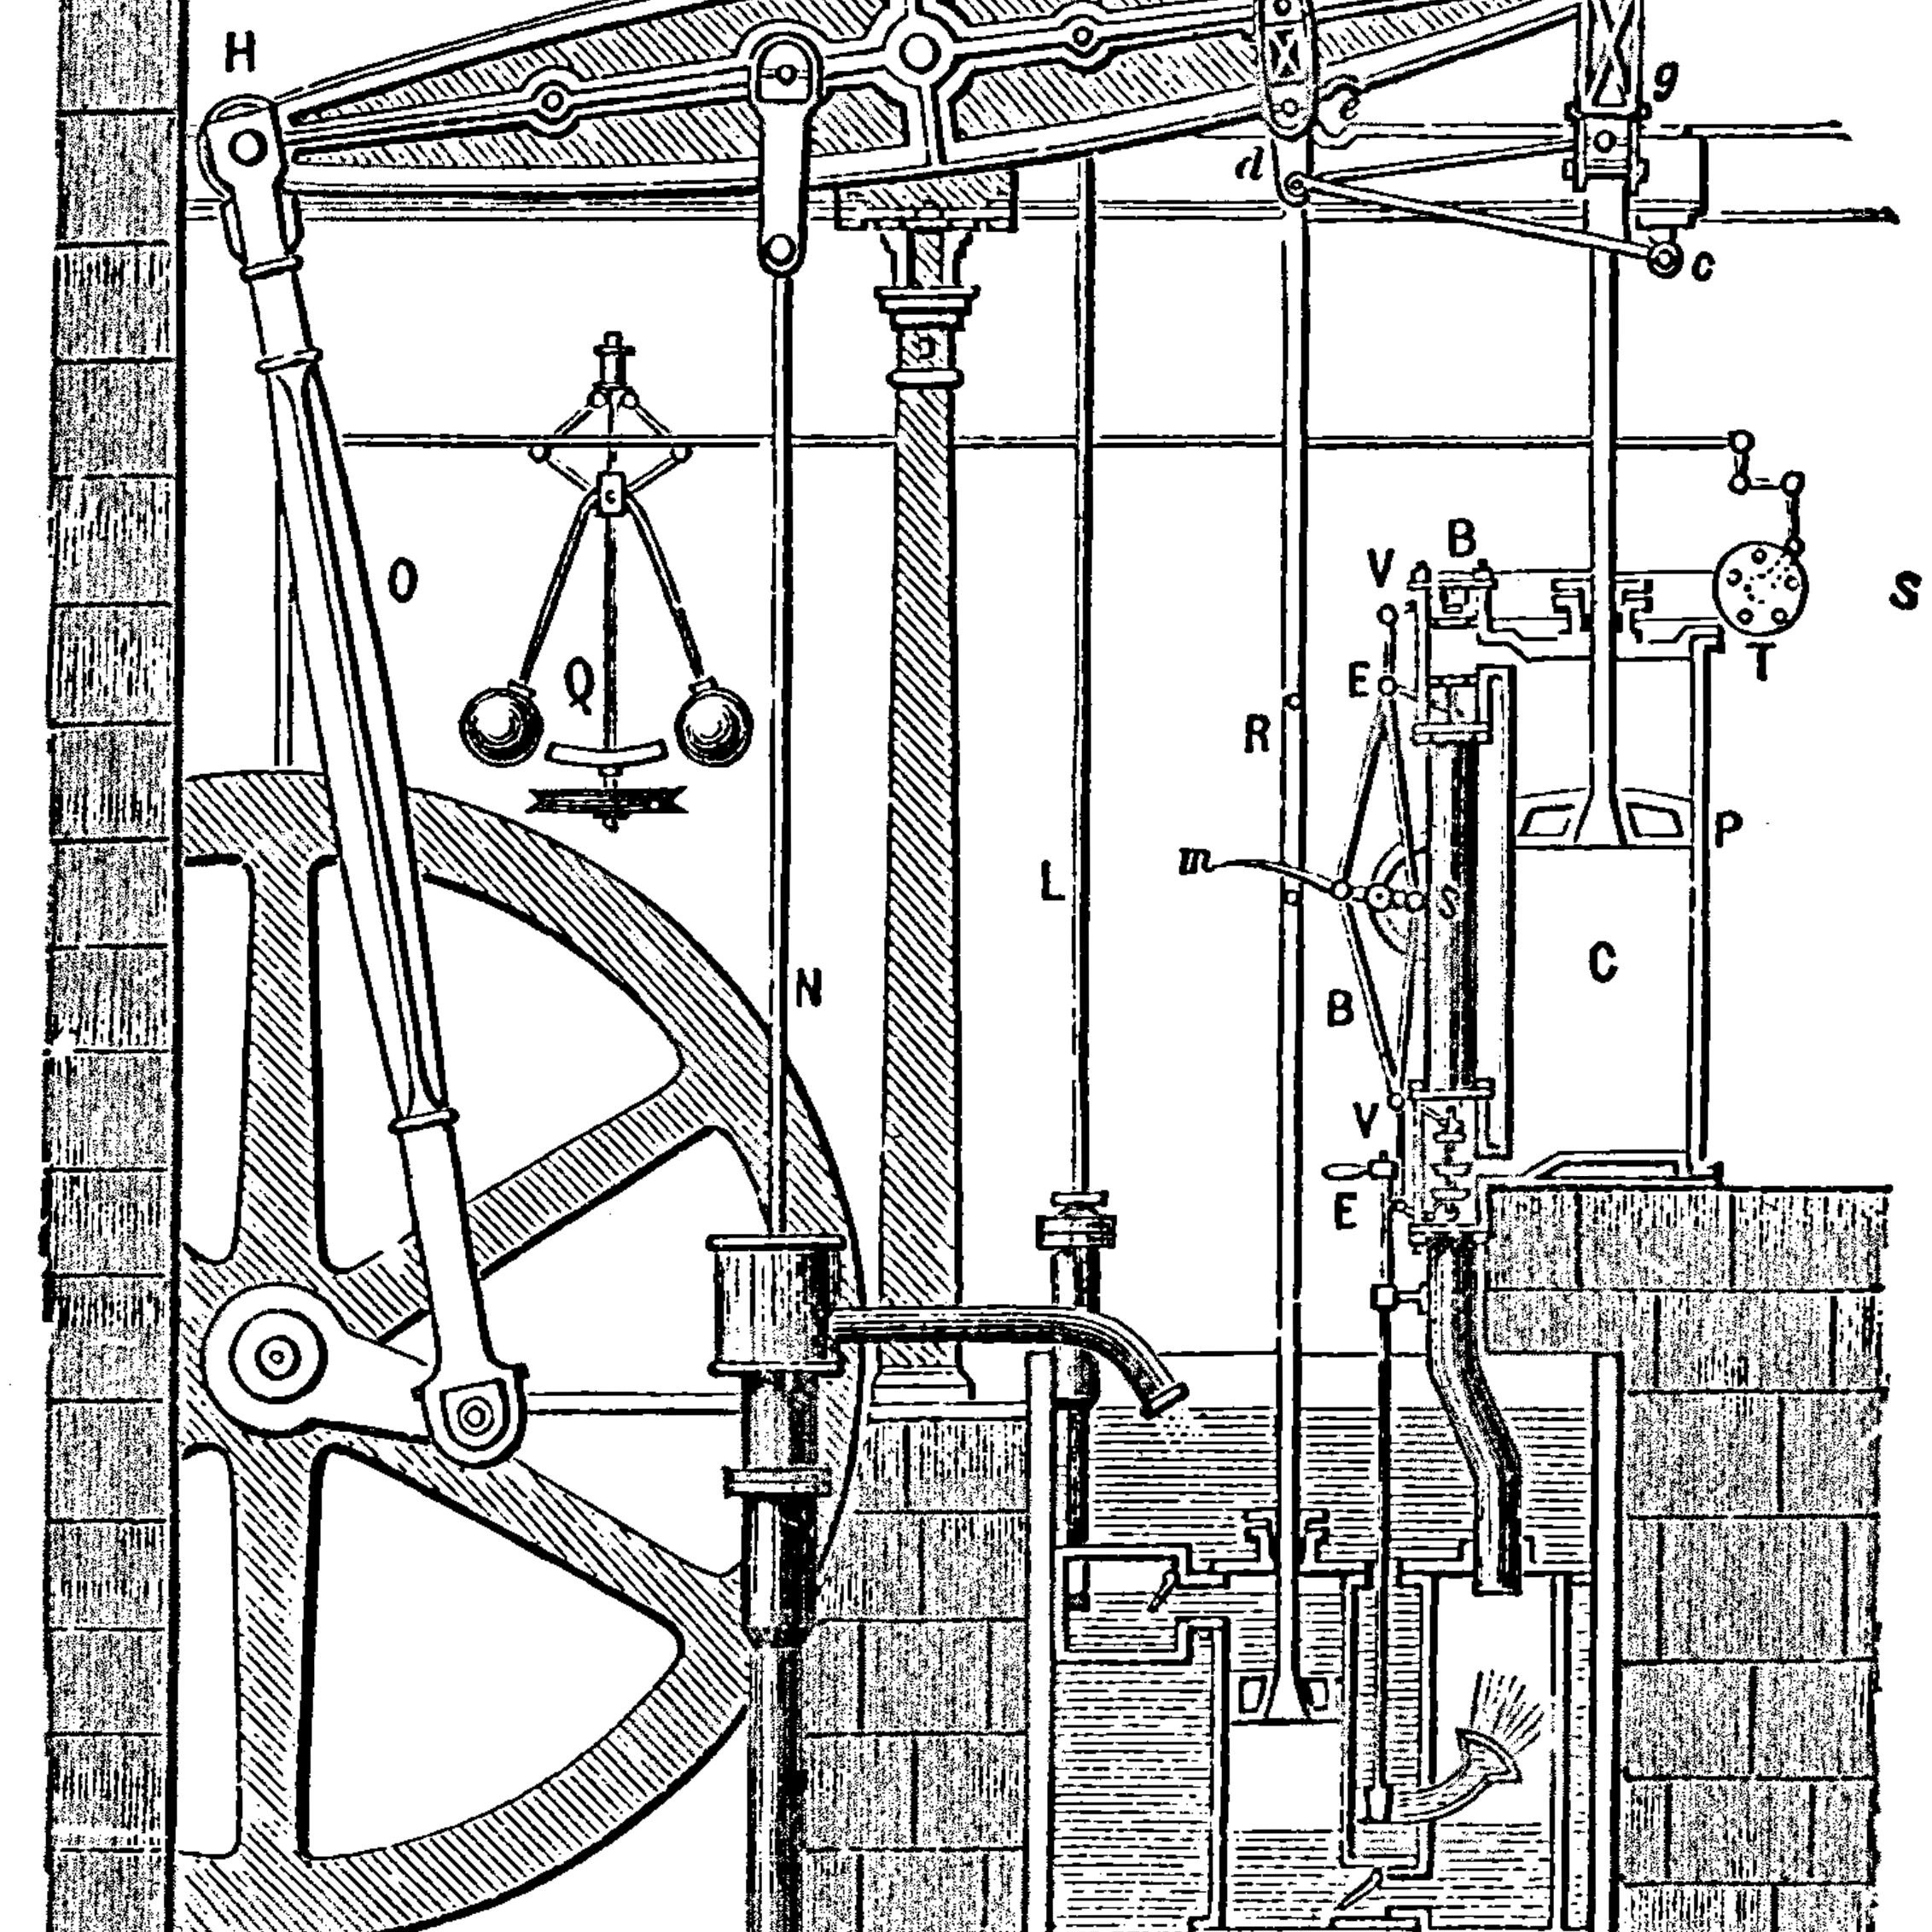 Sketch showing a steam engine designed by Boulton & Watt, England, 1784.